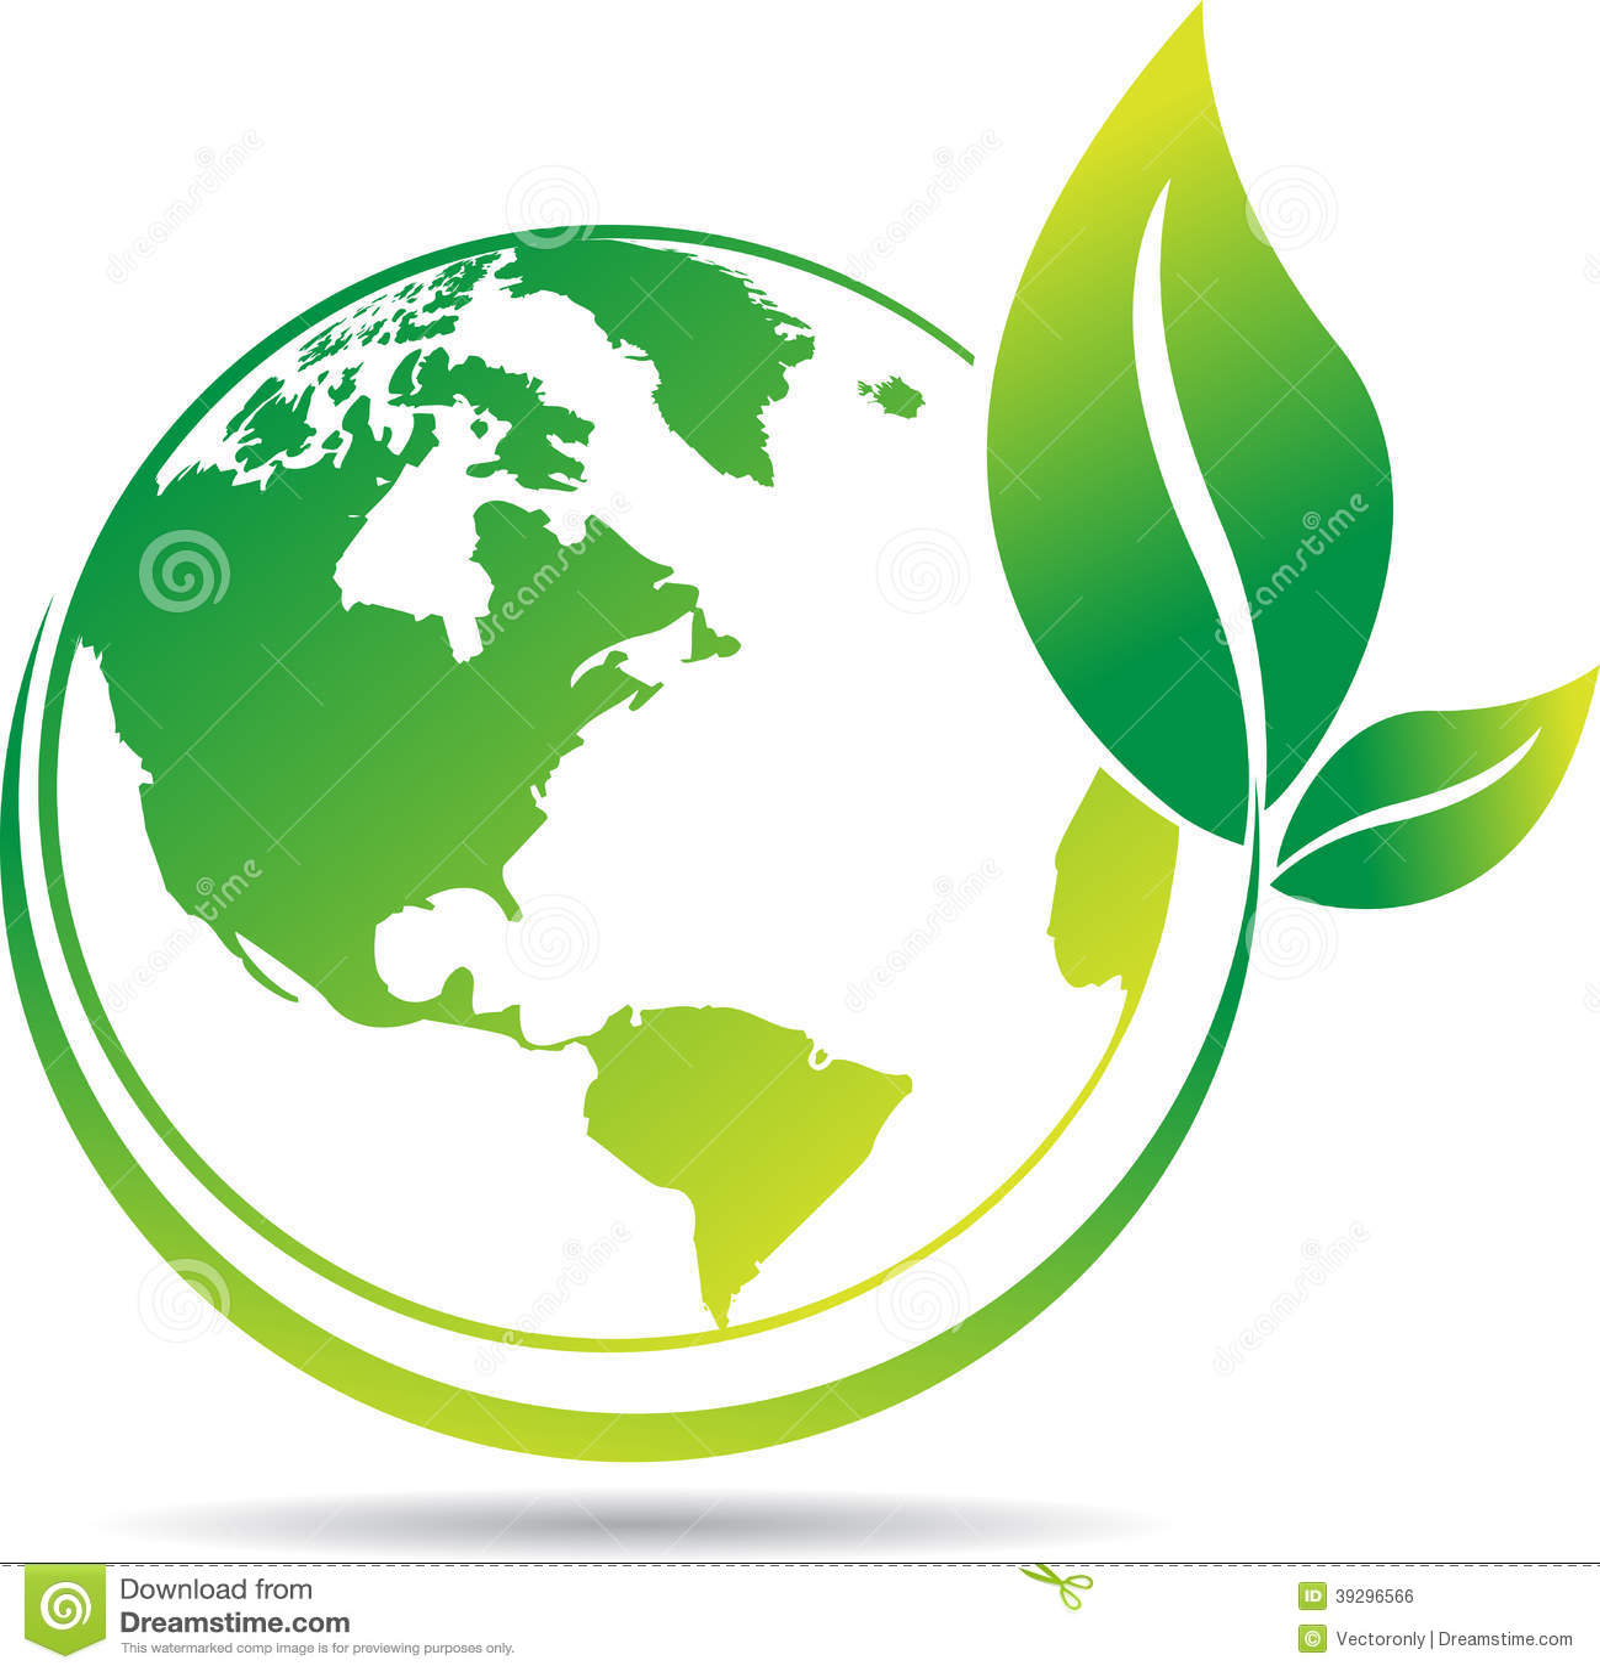 Globe Tree Stock Vector - Image: 39296566